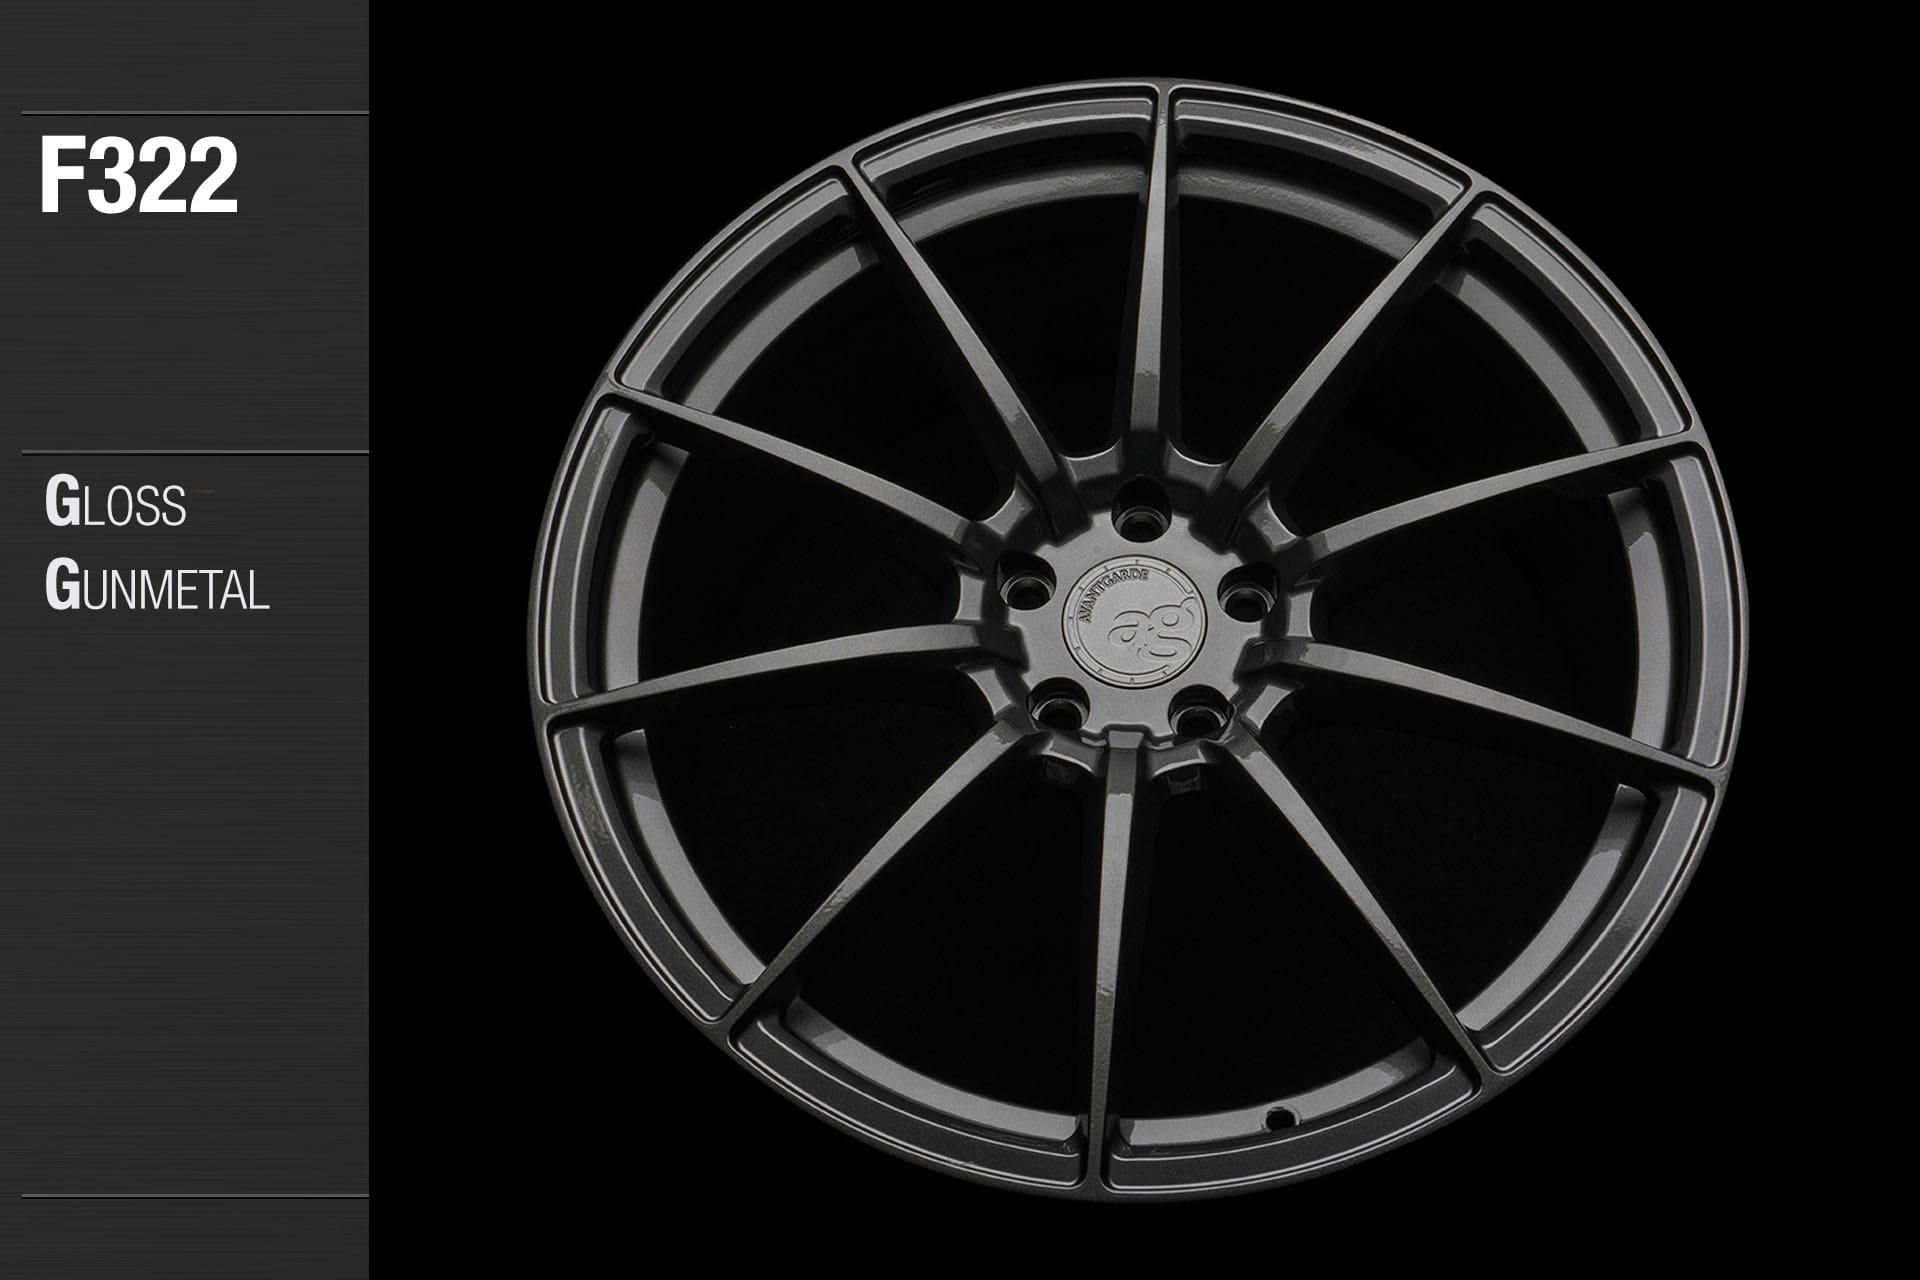 avant-garde-ag-wheels-f322-gloss-gunmetal-3-min